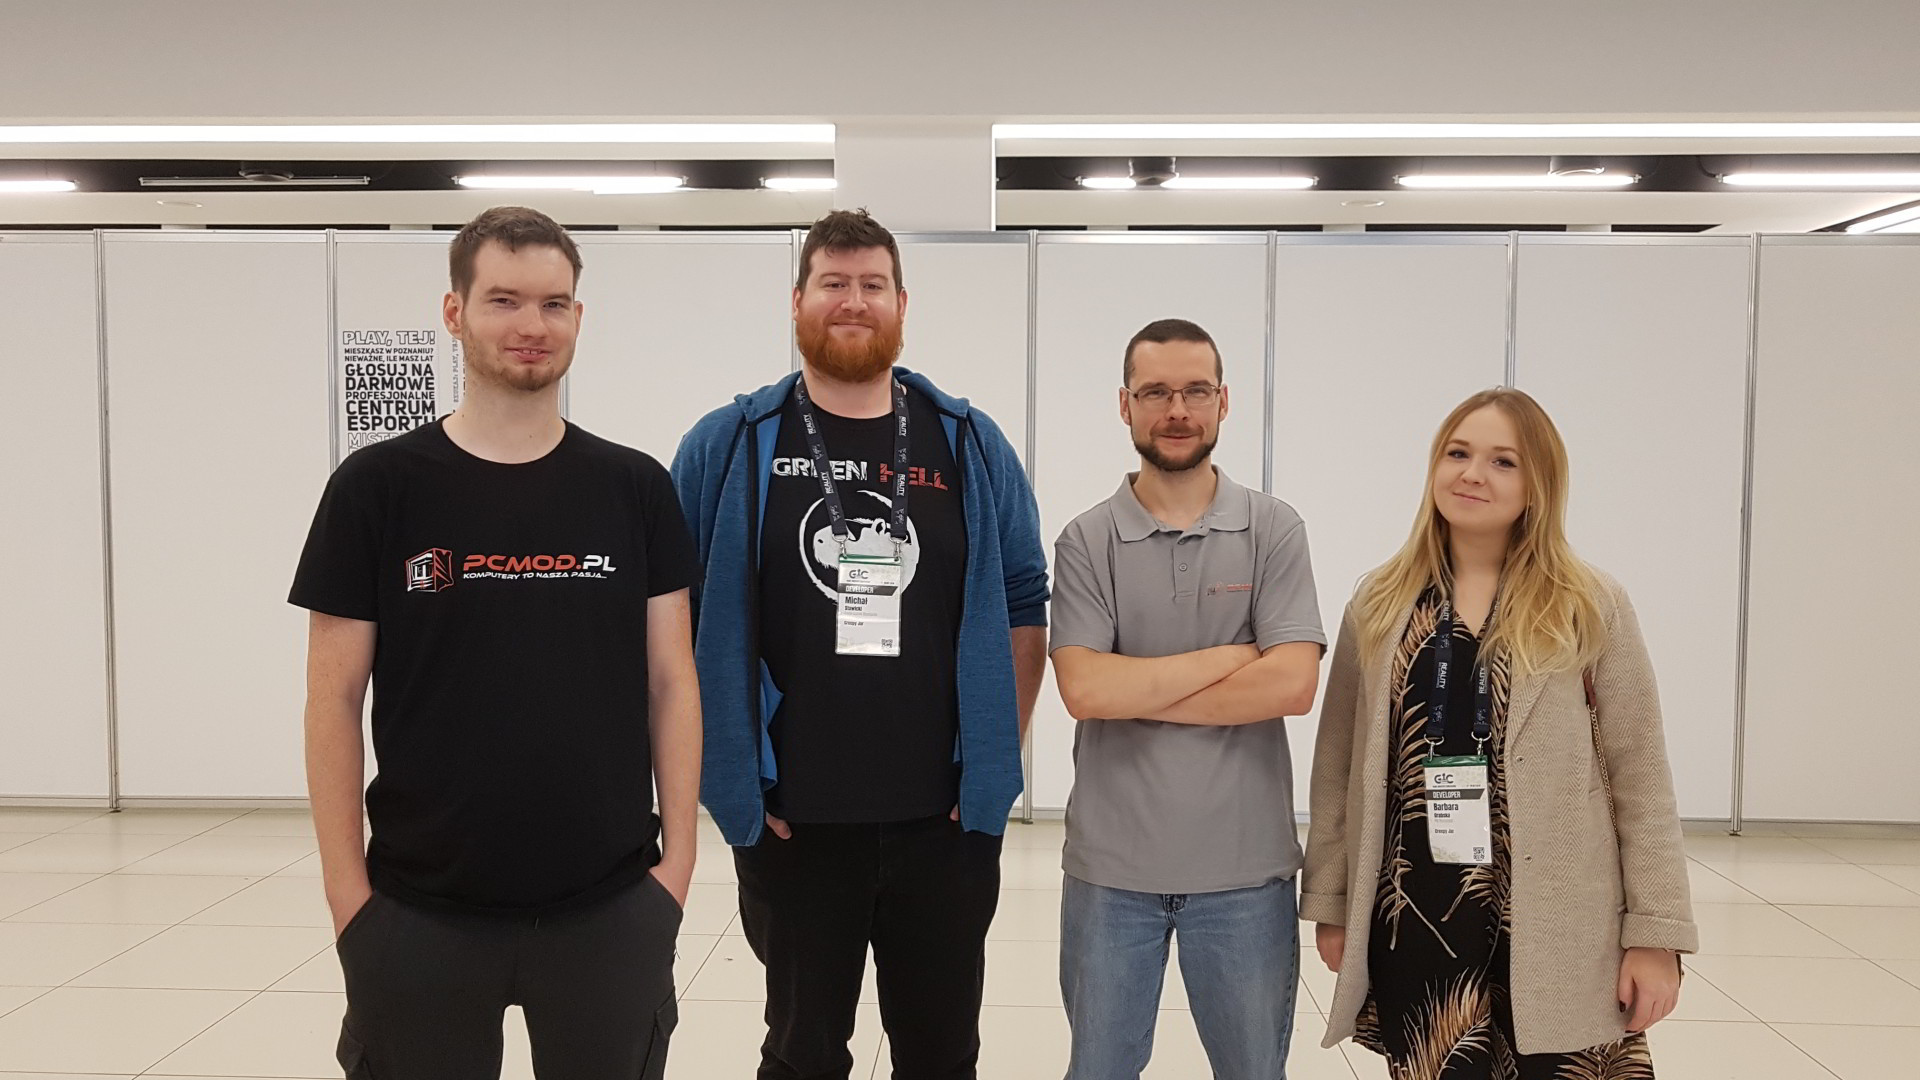 Poznań Game Arena 2019 - Creepy Jar i Green Hell